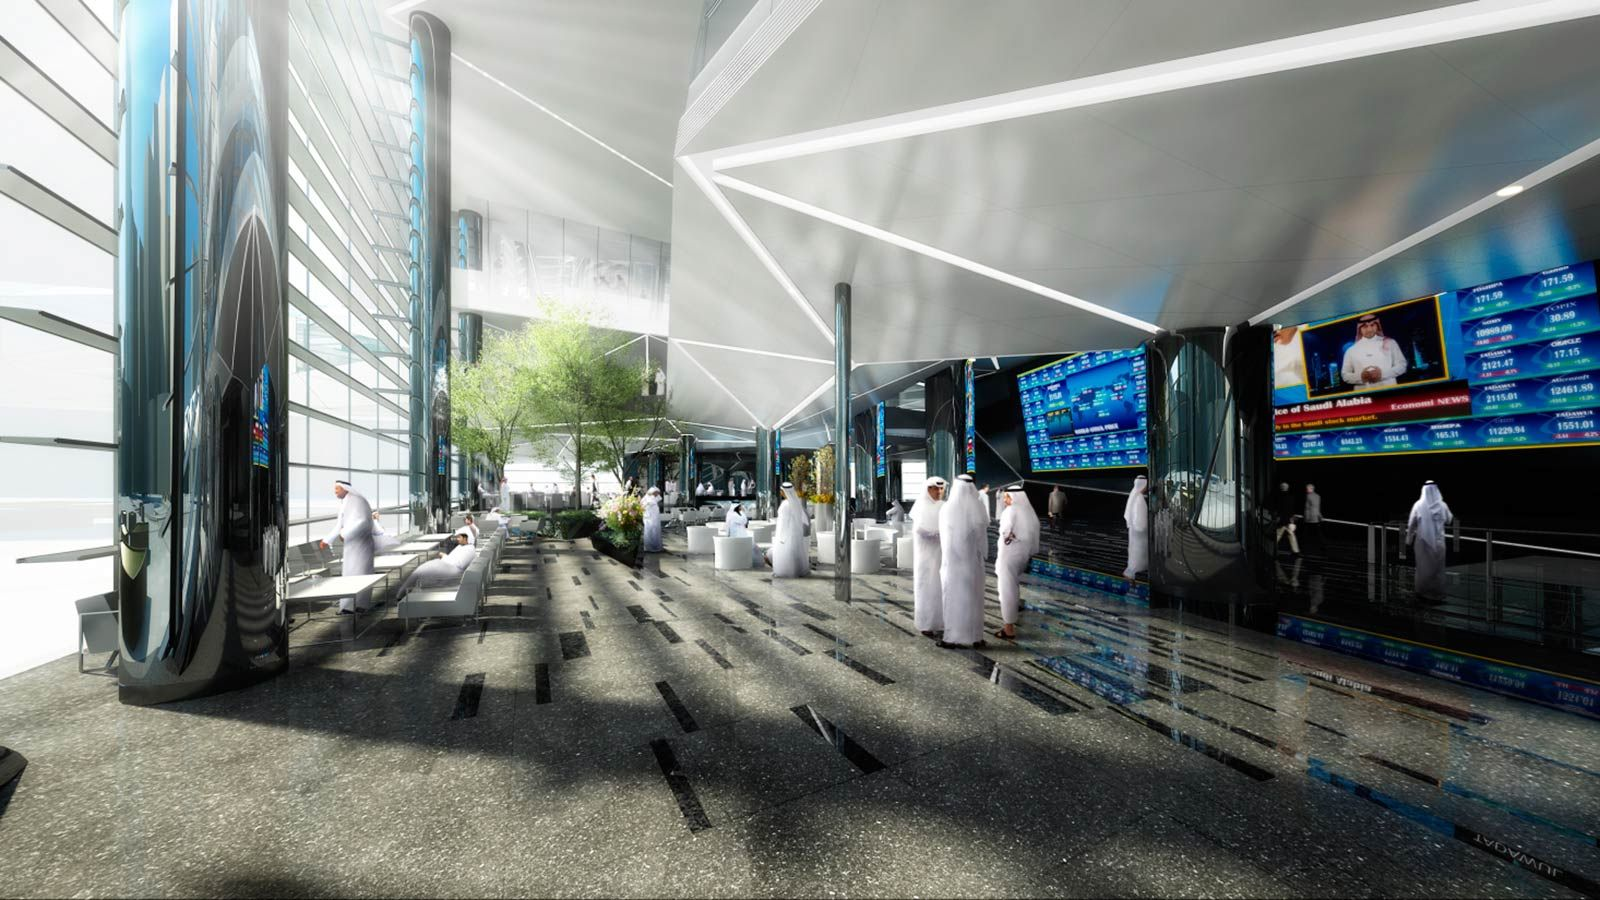 Tadawul a New Silhouette on the Saudi Arabian Skyline - Mace Group